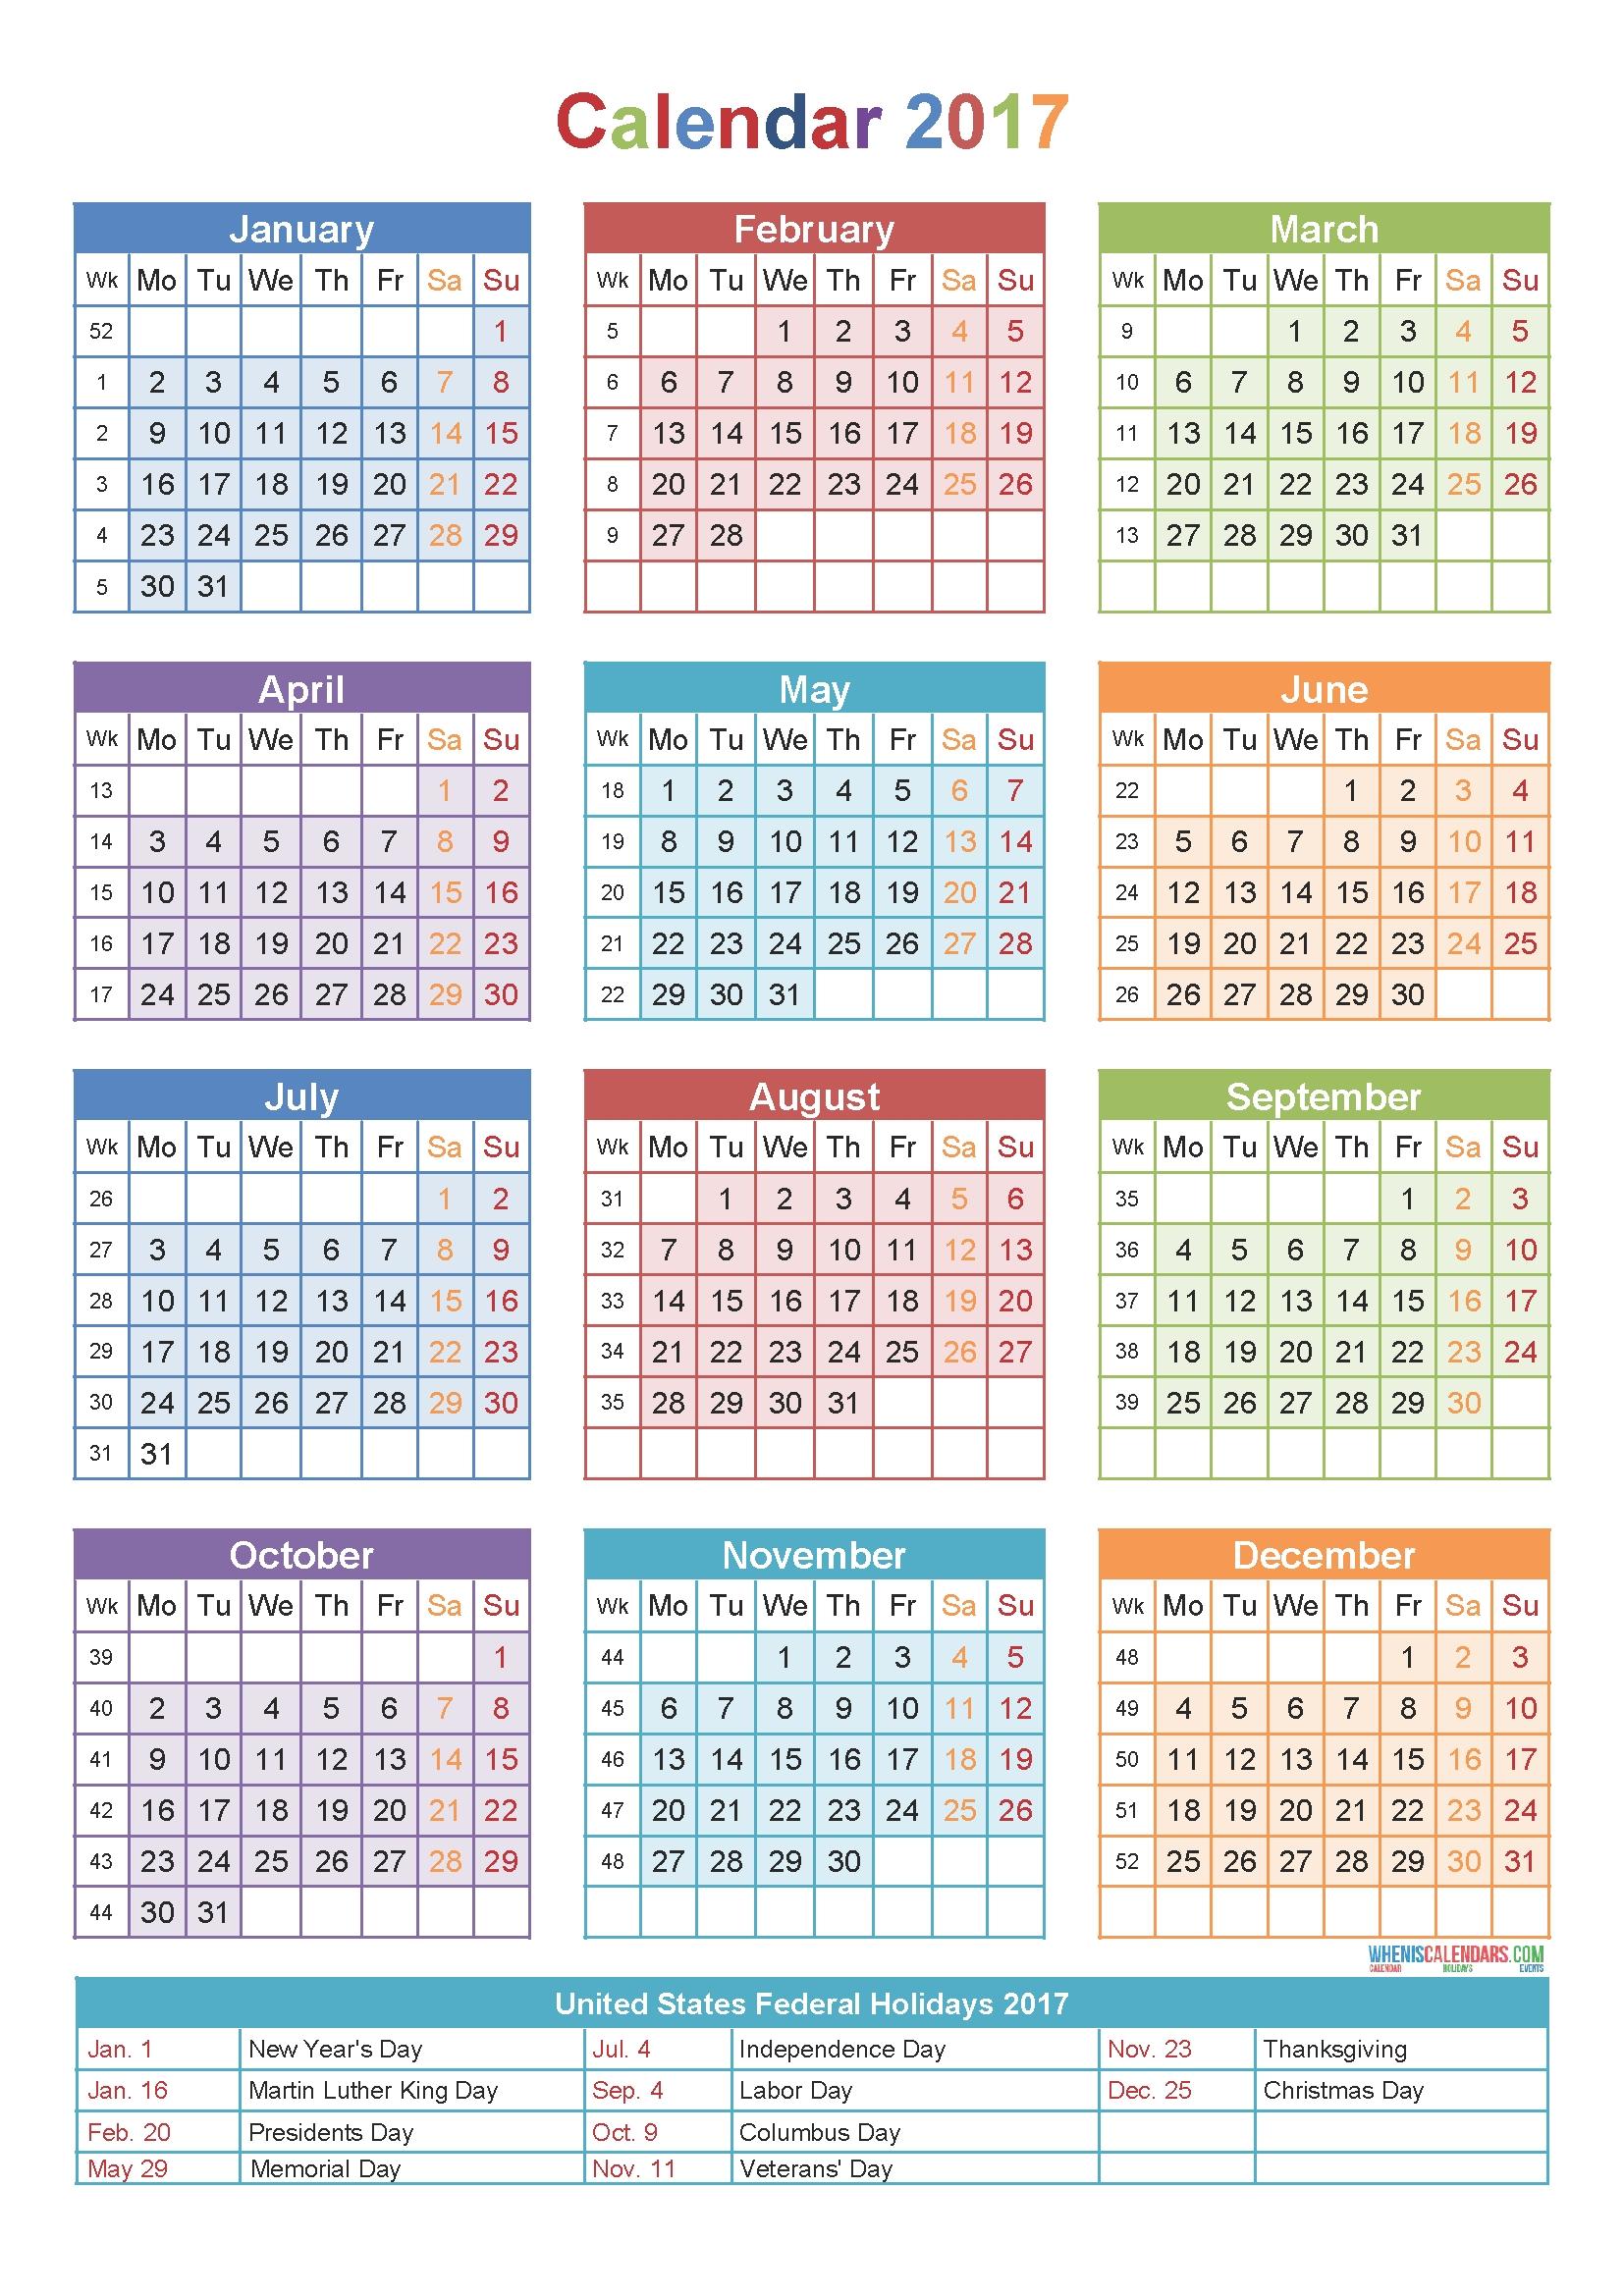 Calendar 2017 Week Number Holidays Pinterest Calendar3abry